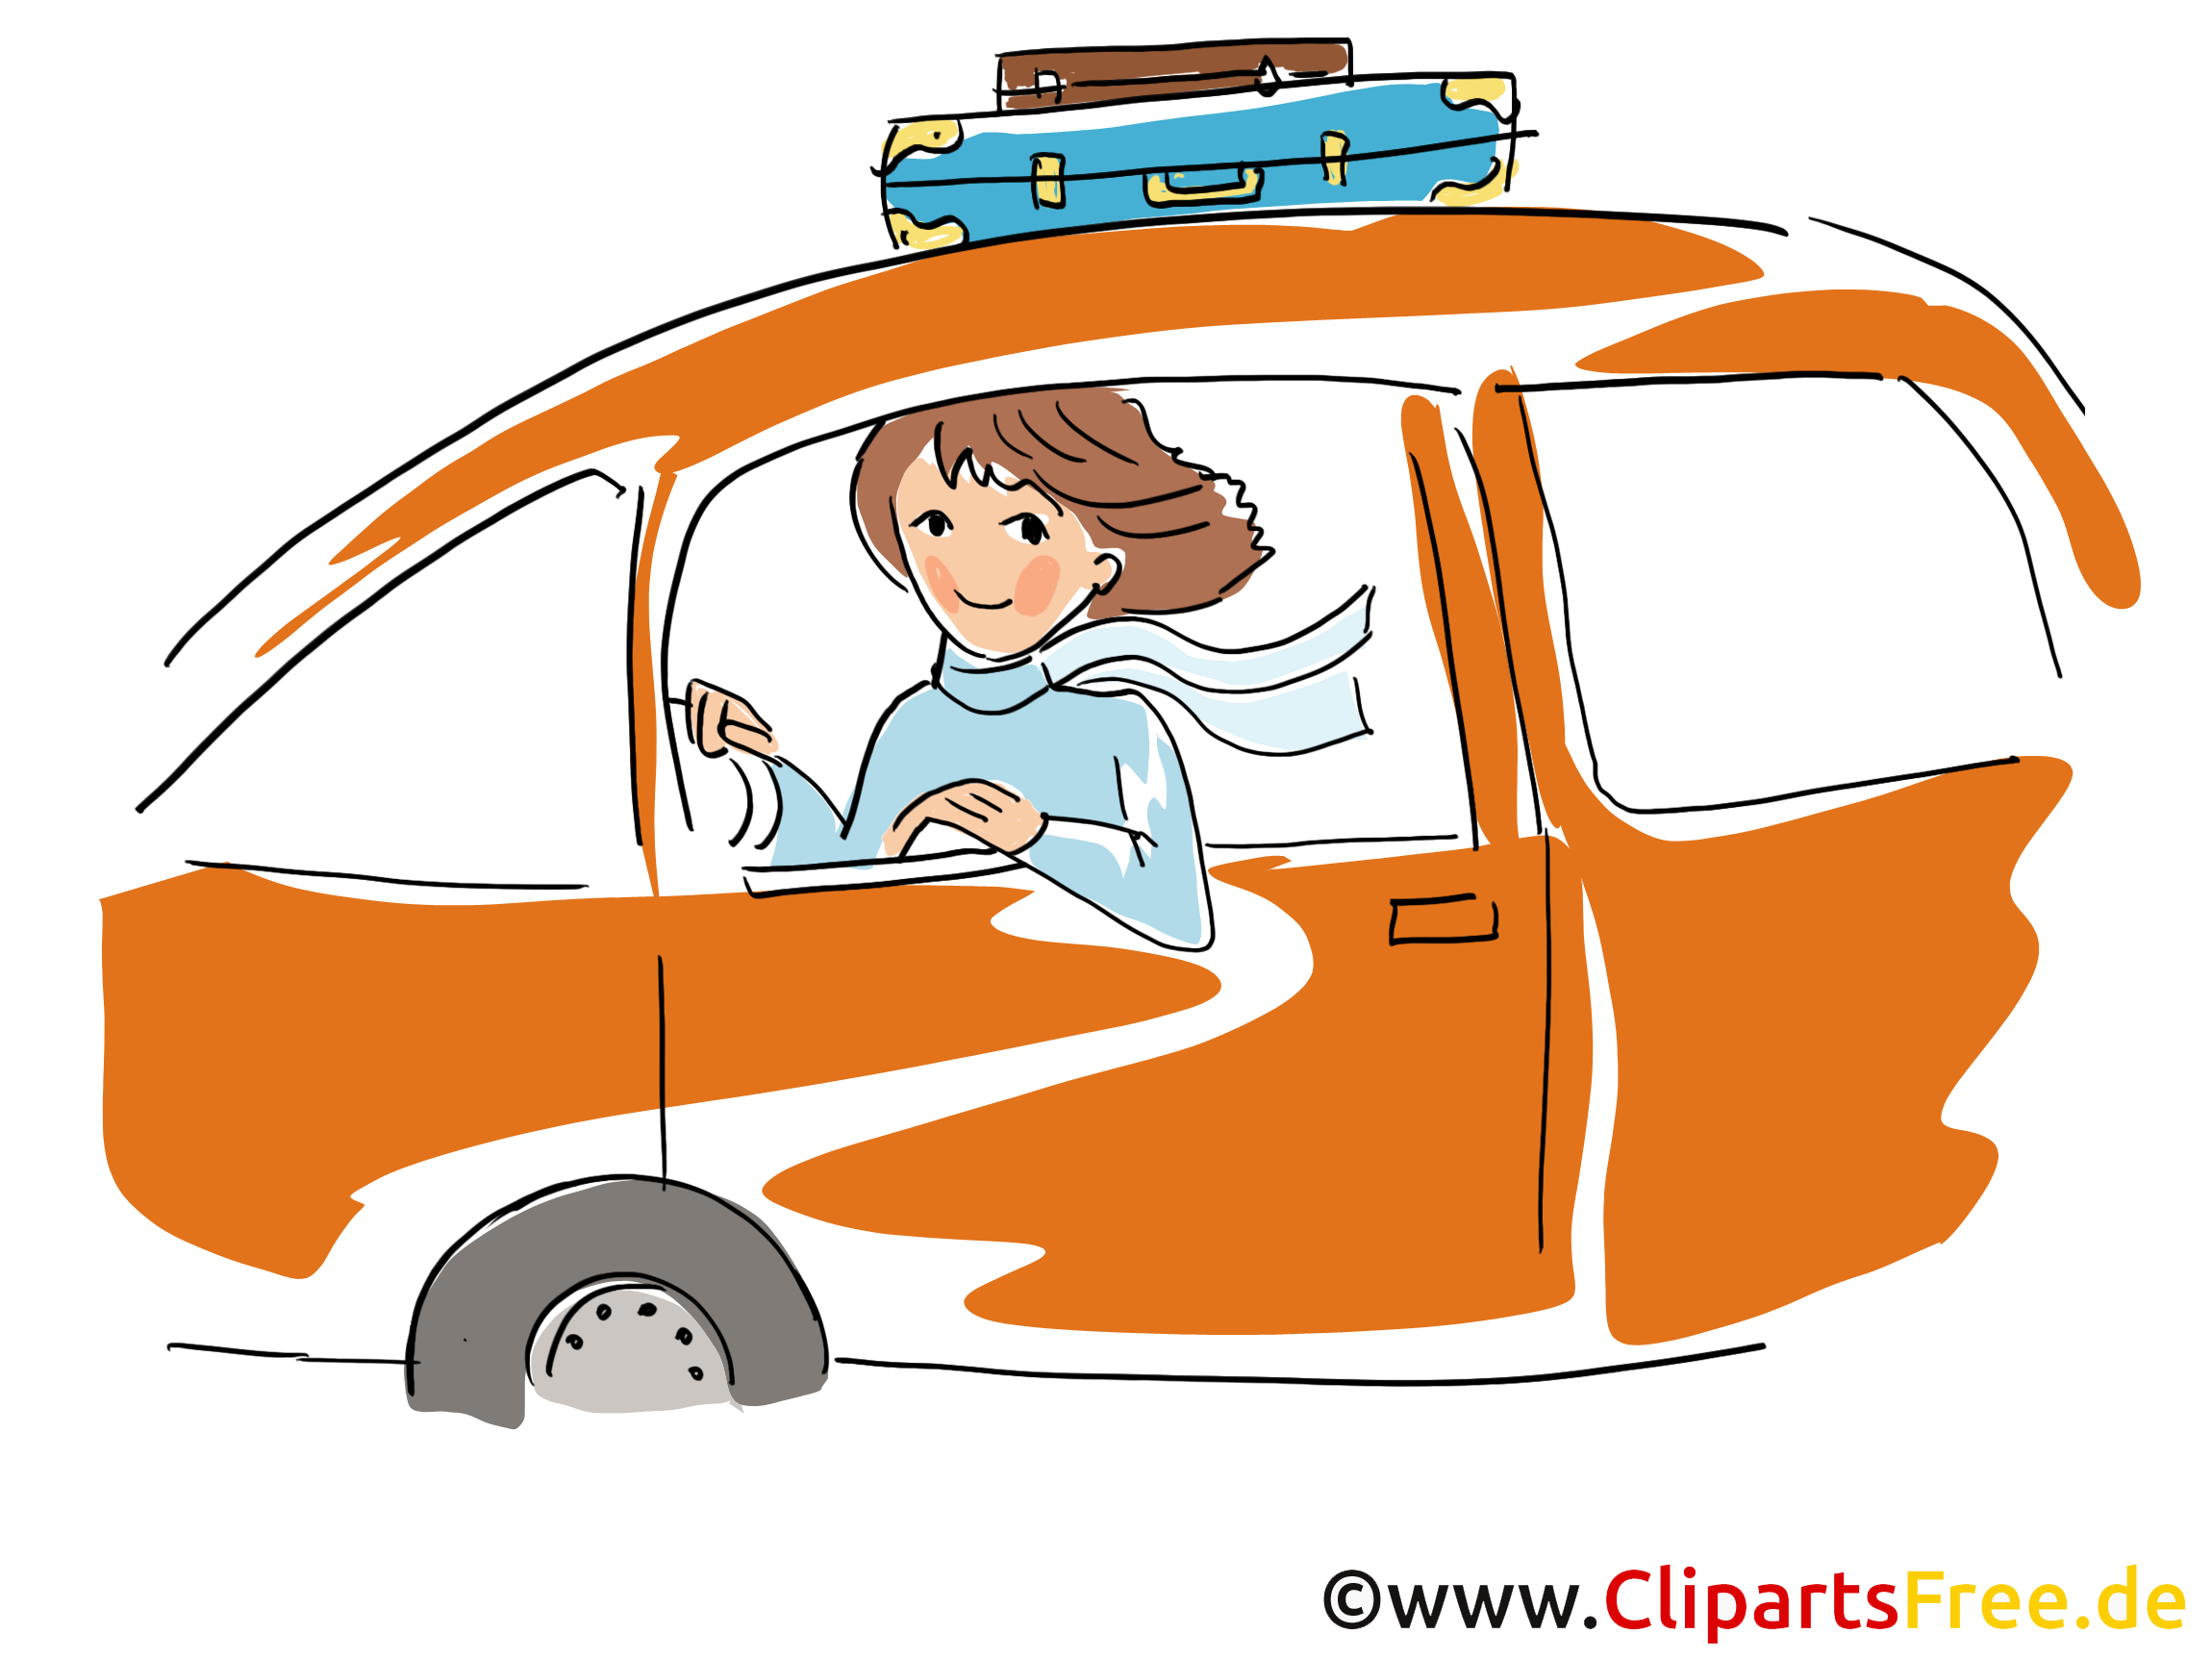 Frau faehrt Auto Clipart, Bild, Grafik, Cartoon, Illustration gratis